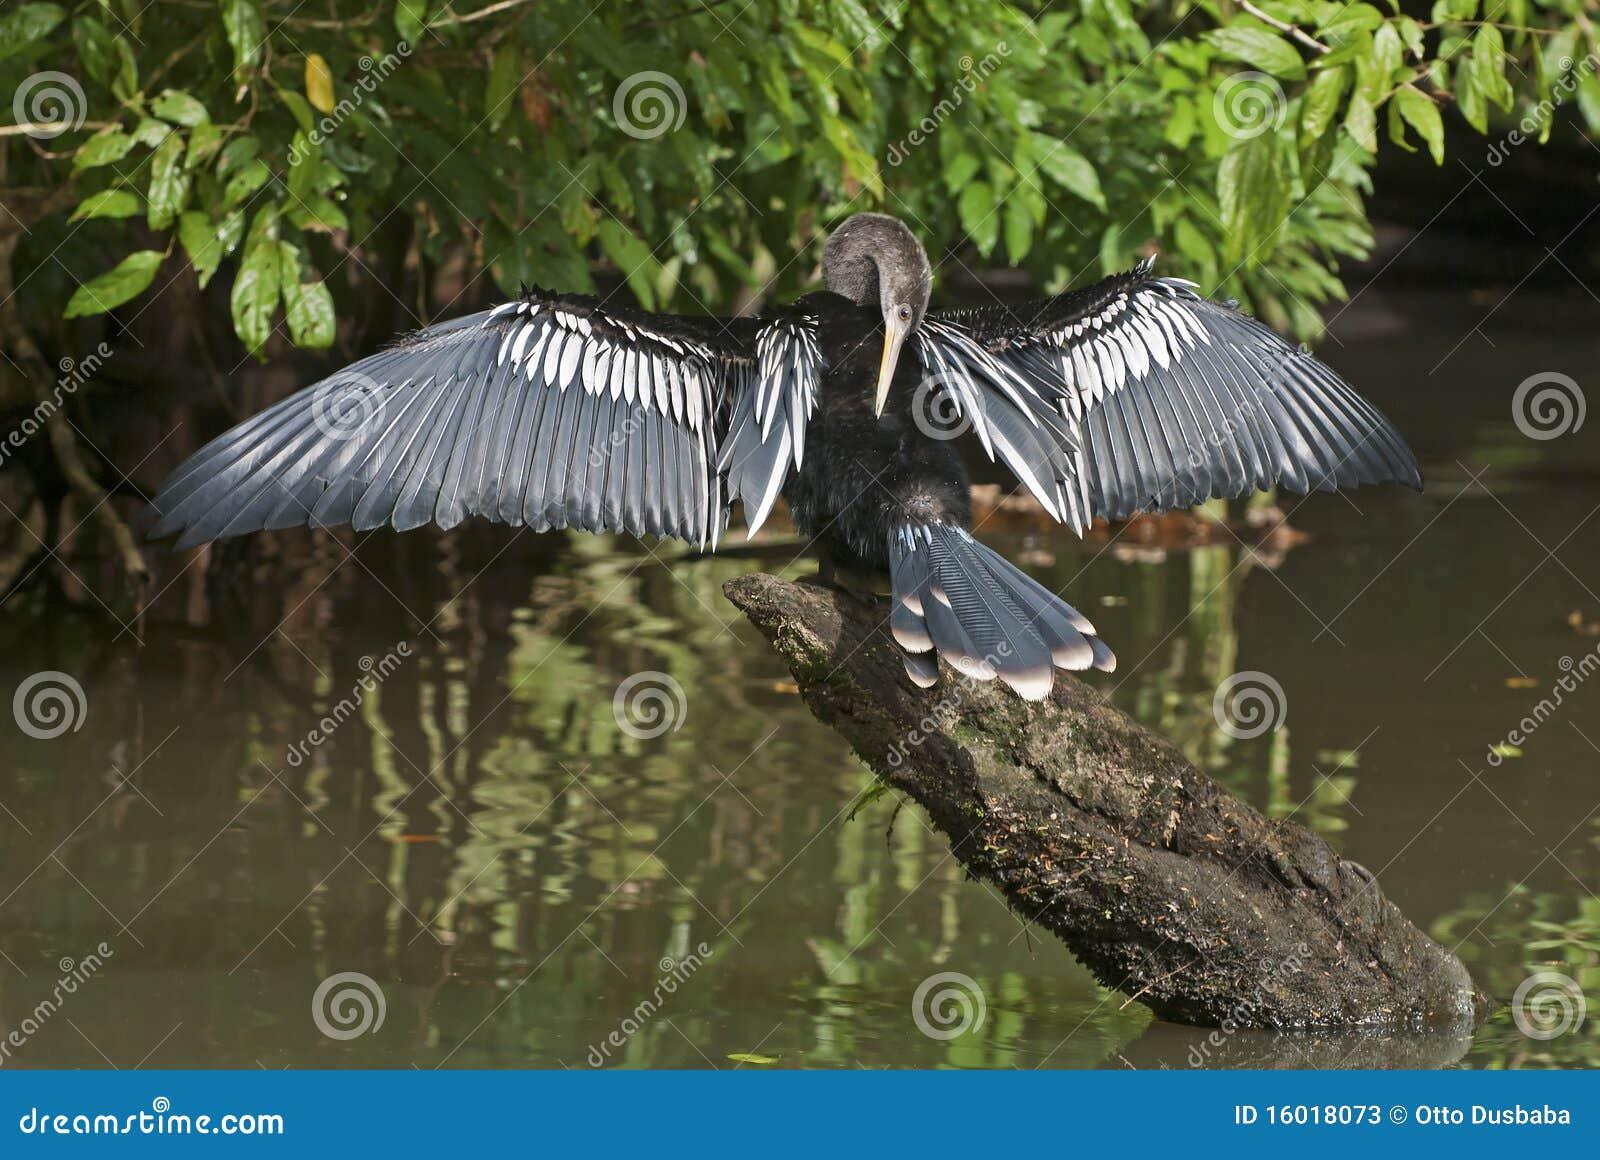 Oiseau d eau d Anhinga séchant son plumage